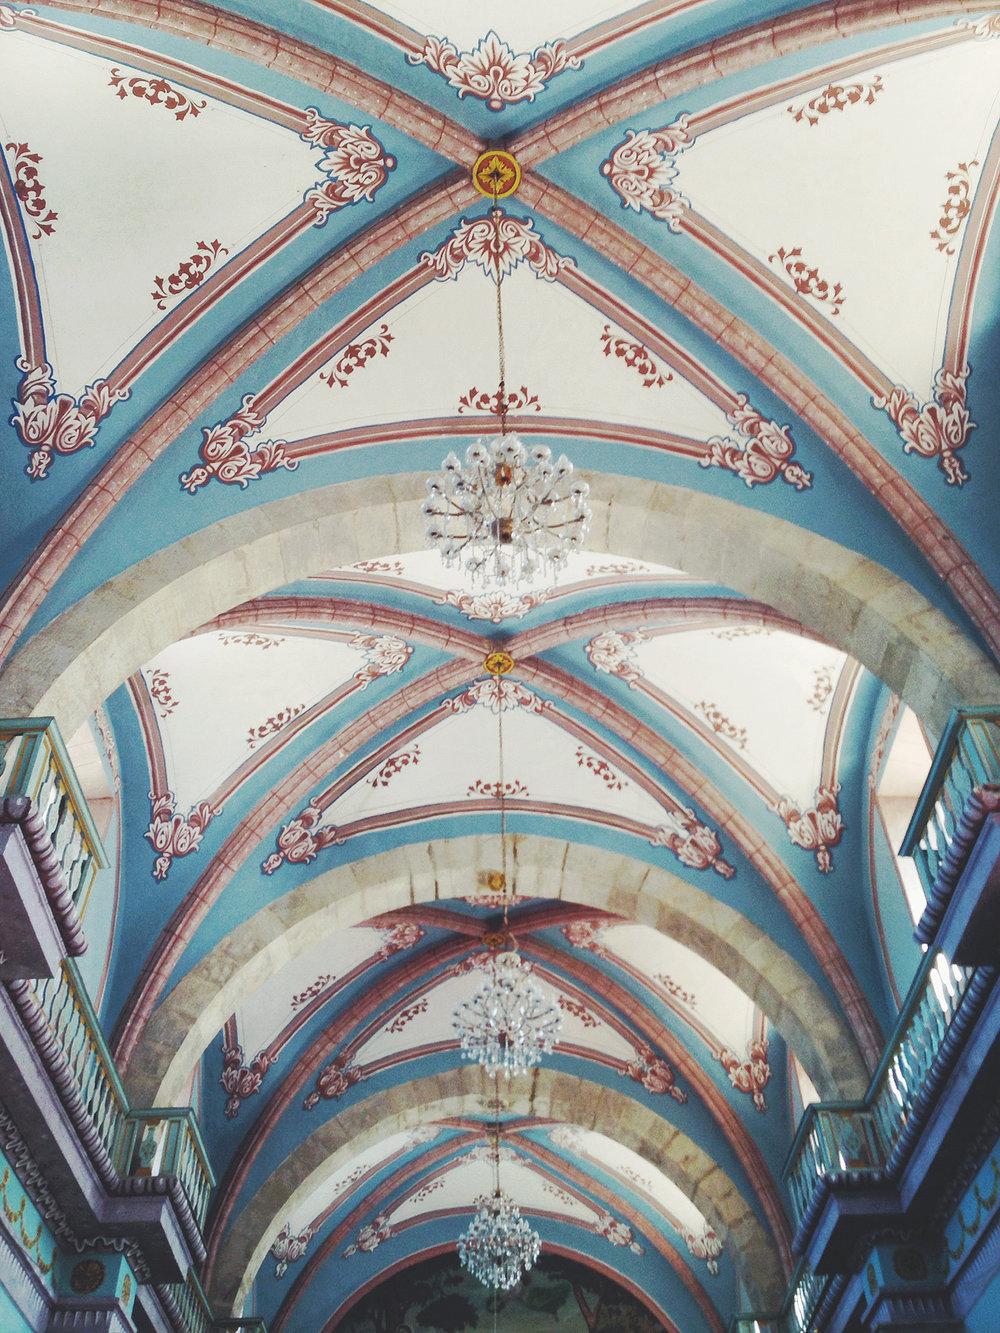 Bea Rue Professional Freelance Wedding Event Travel Photographer Hudson Valley NY Mexico Church Architecture.jpg